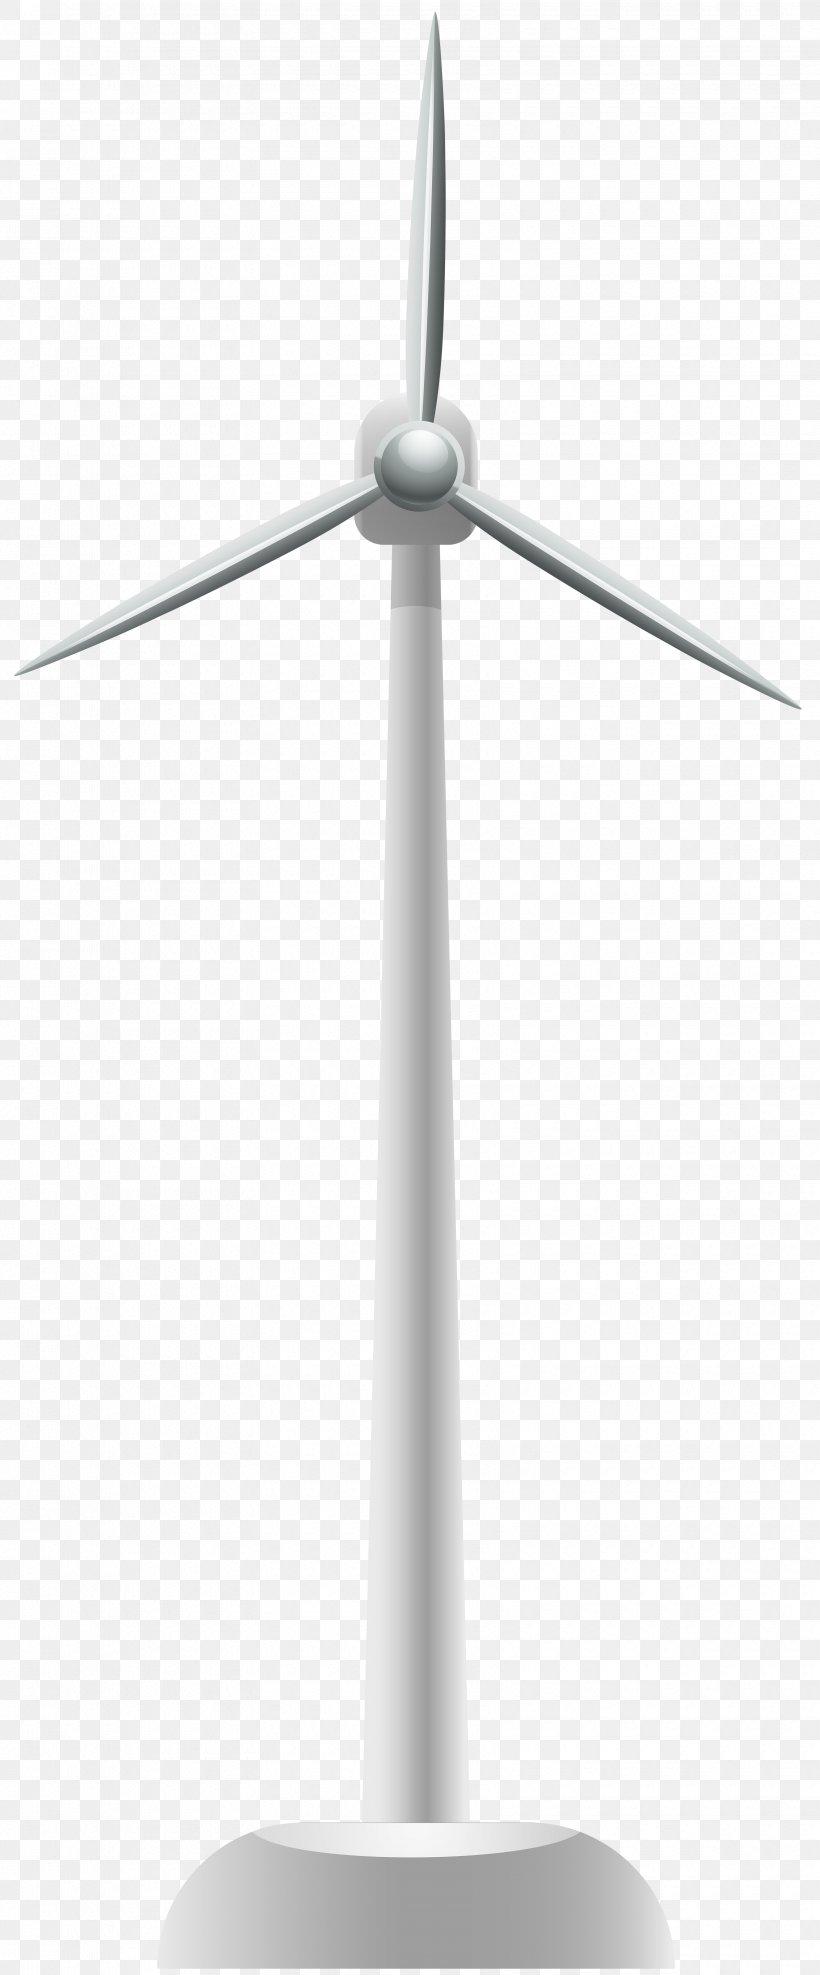 Energy Windmill Clip Art